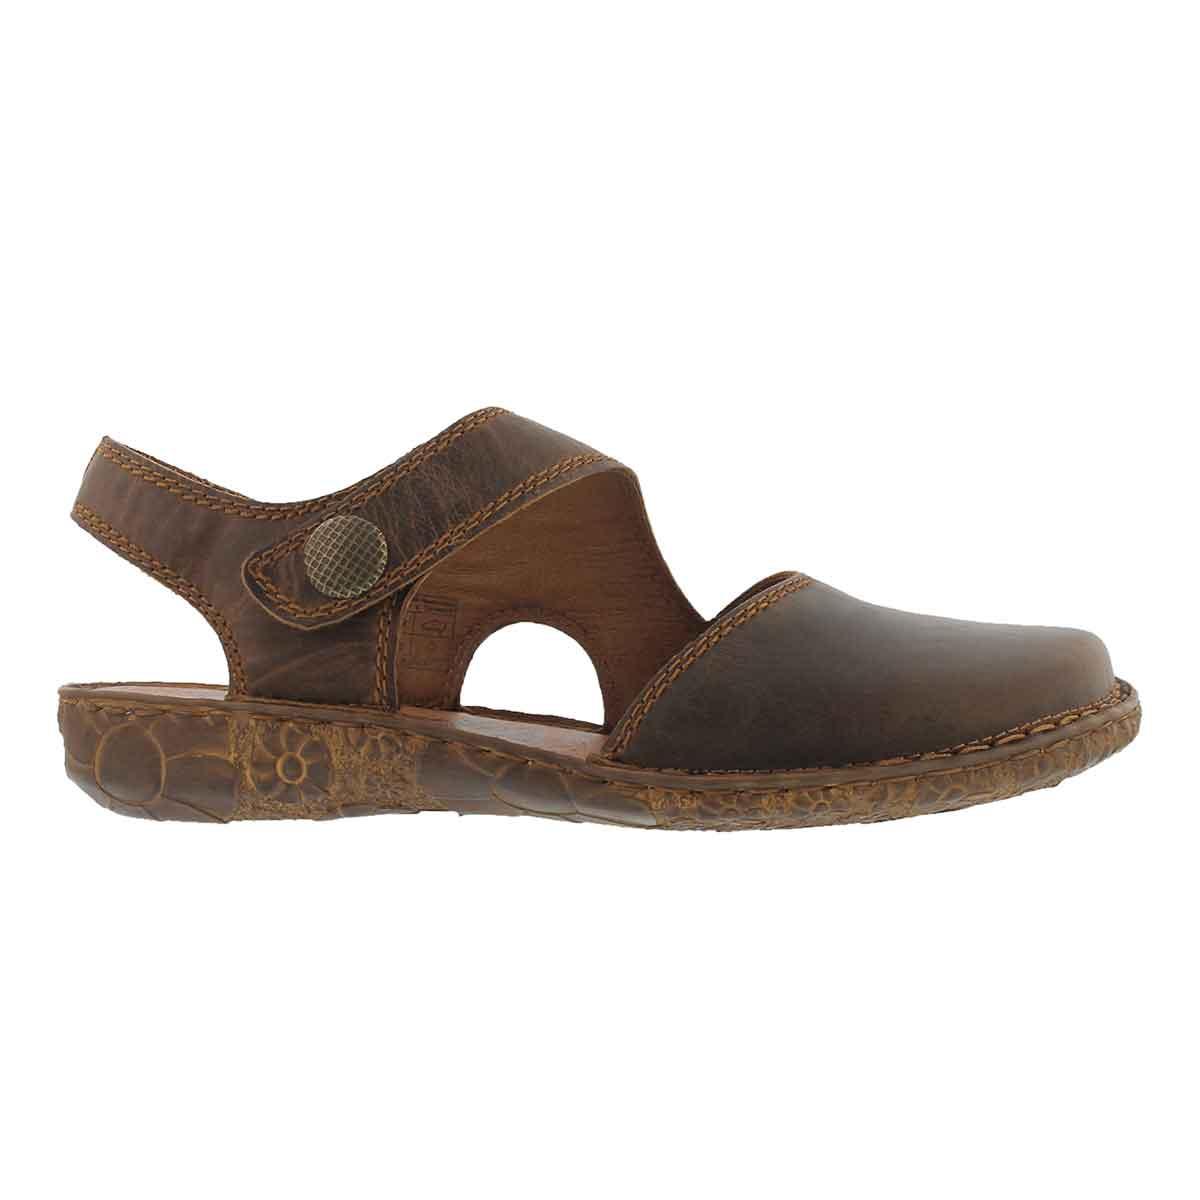 Lds Rosalie 27 brandy casual sandal